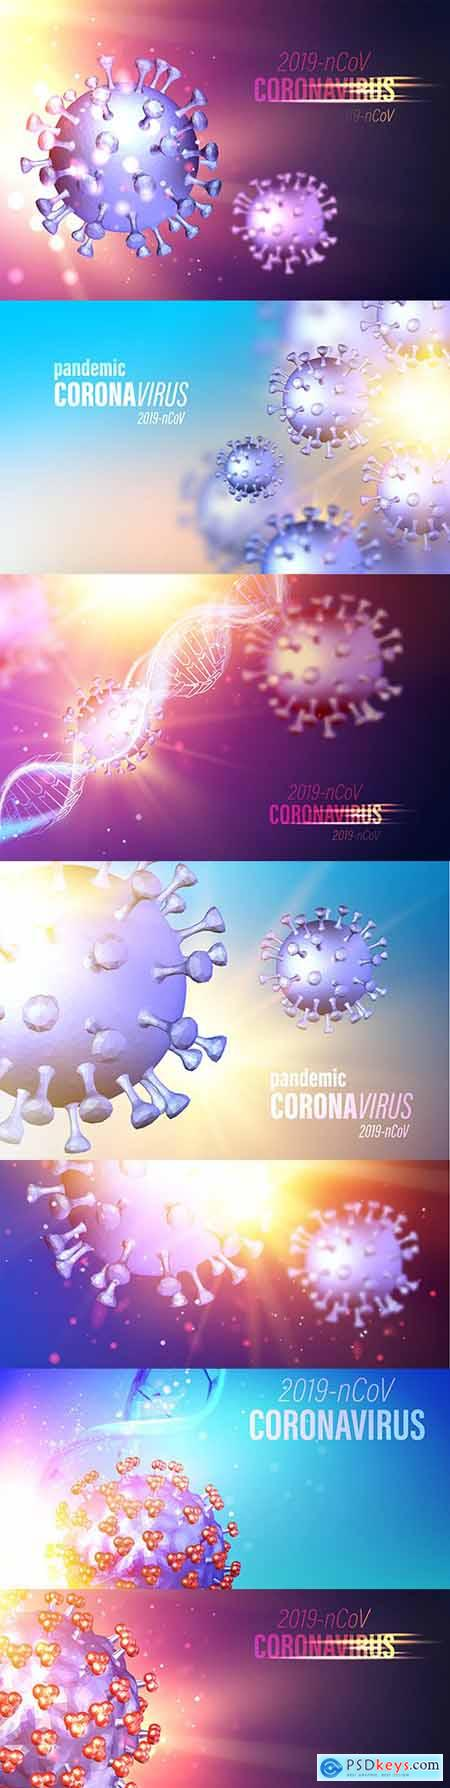 Computer model of coronavirus bacteria in futuristic rays